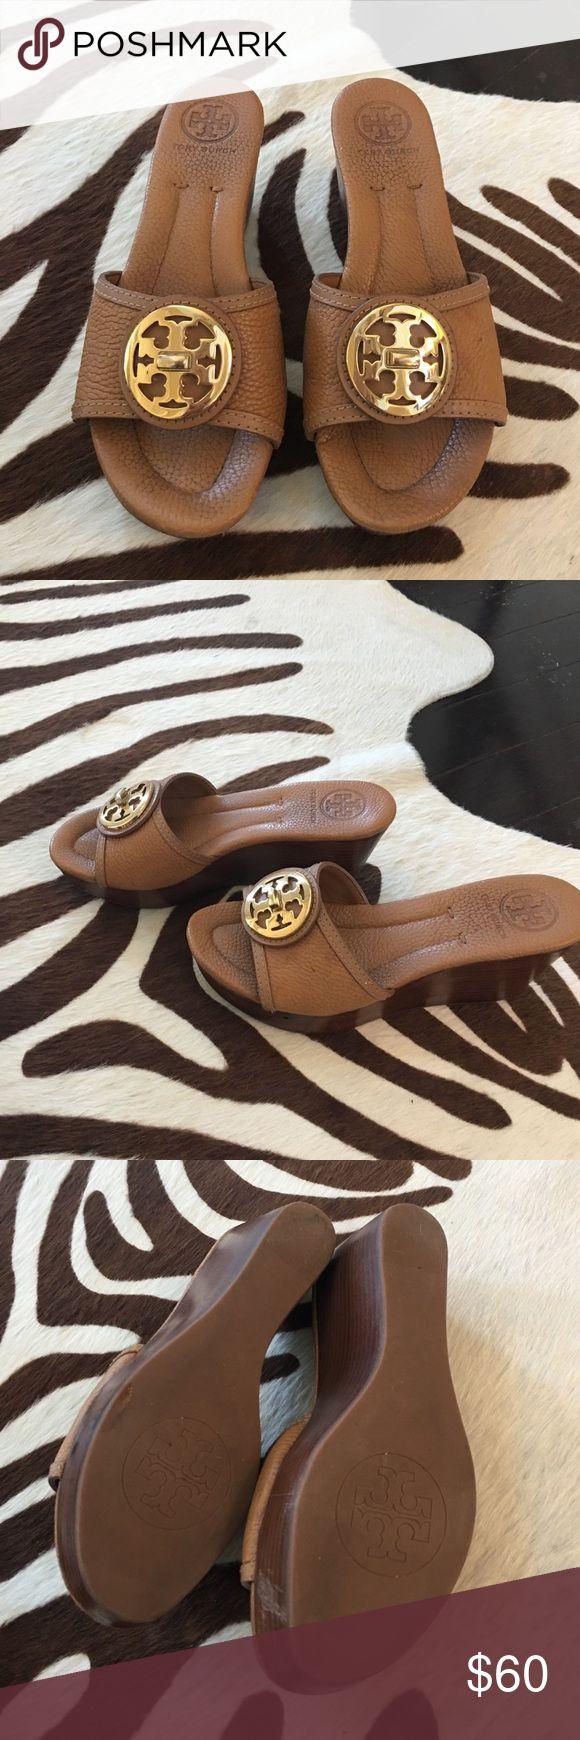 Neutral wedges Neutral Tori Burch wedges. Normal wear. Tory Burch Shoes Wedges